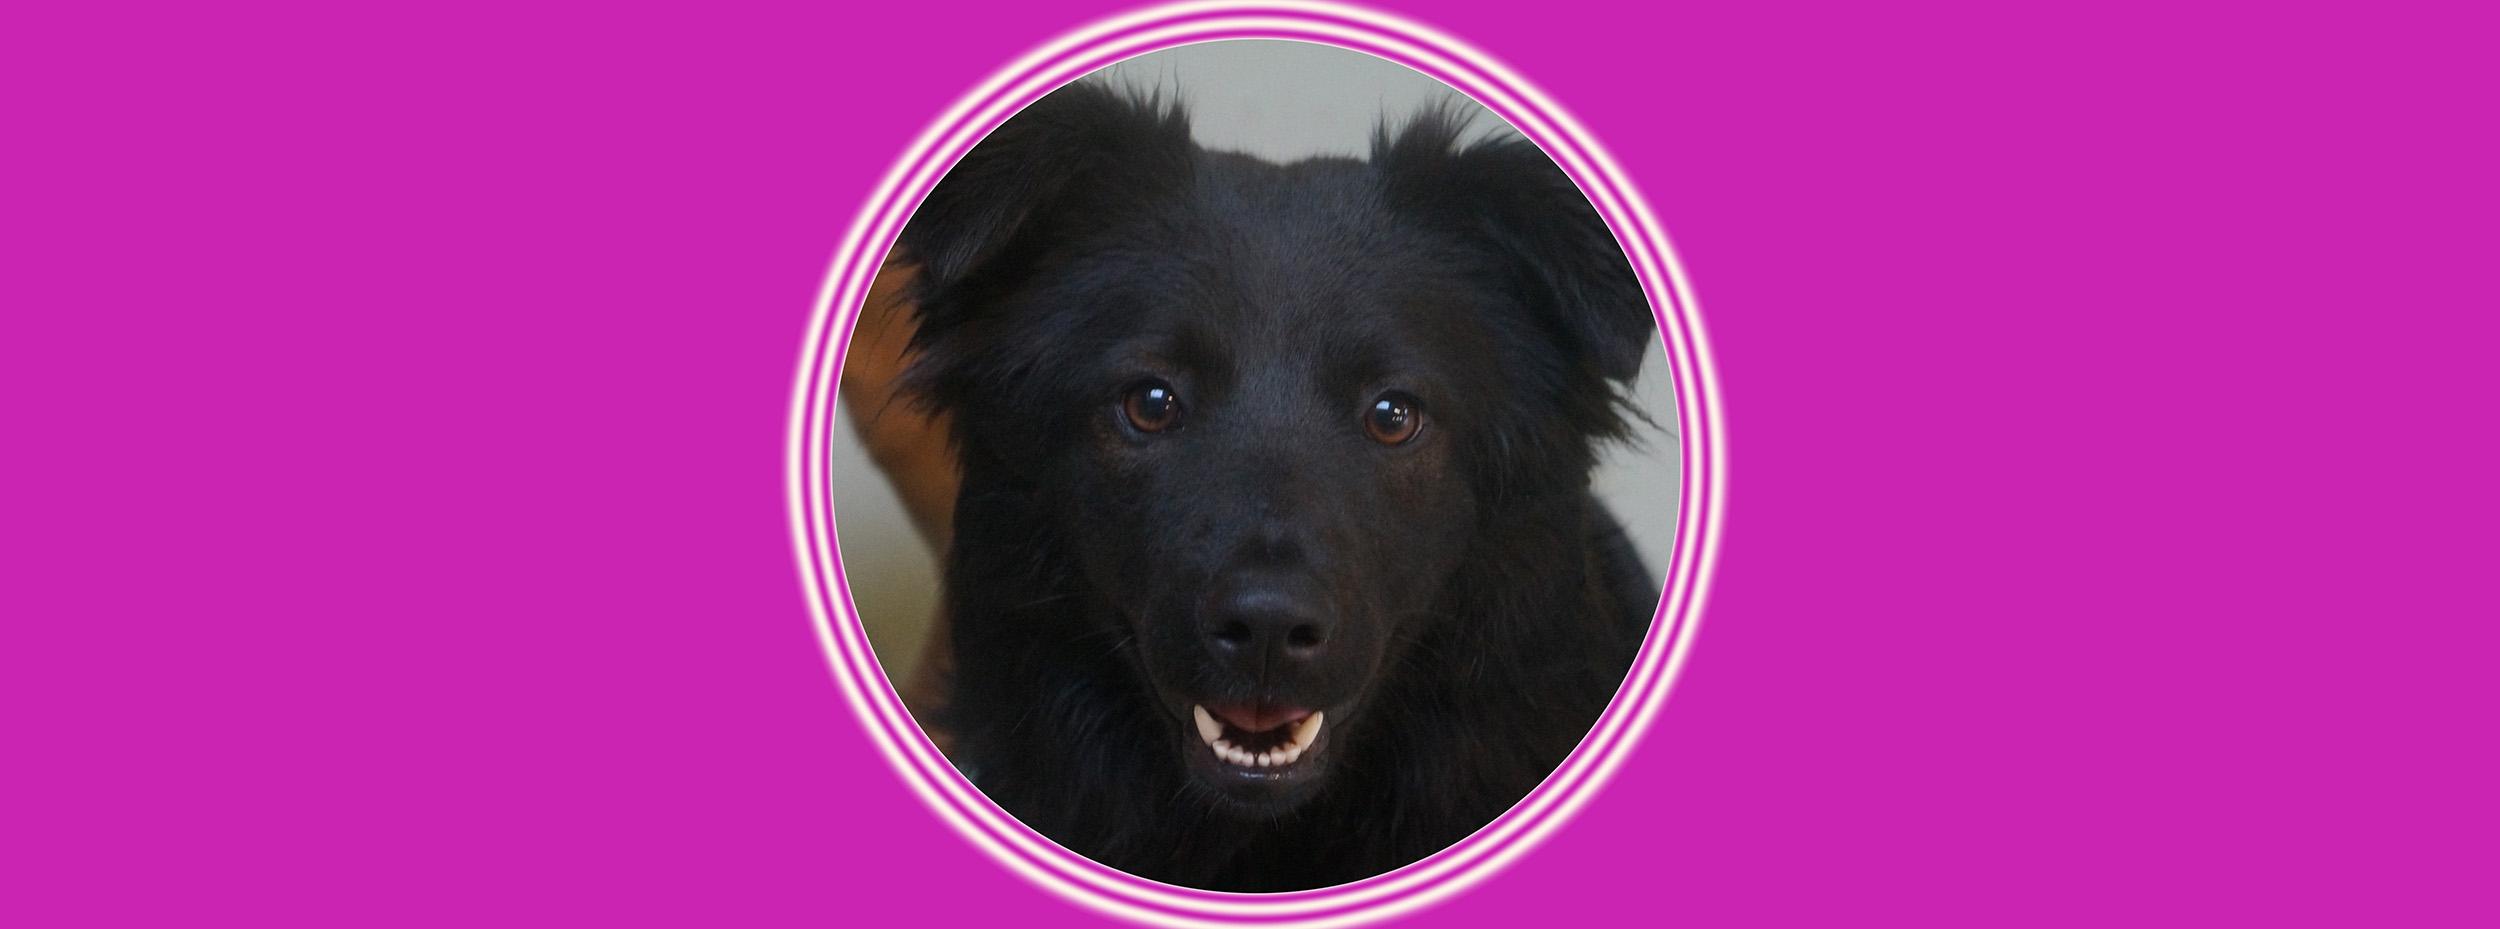 Dog of the Week: Moxie